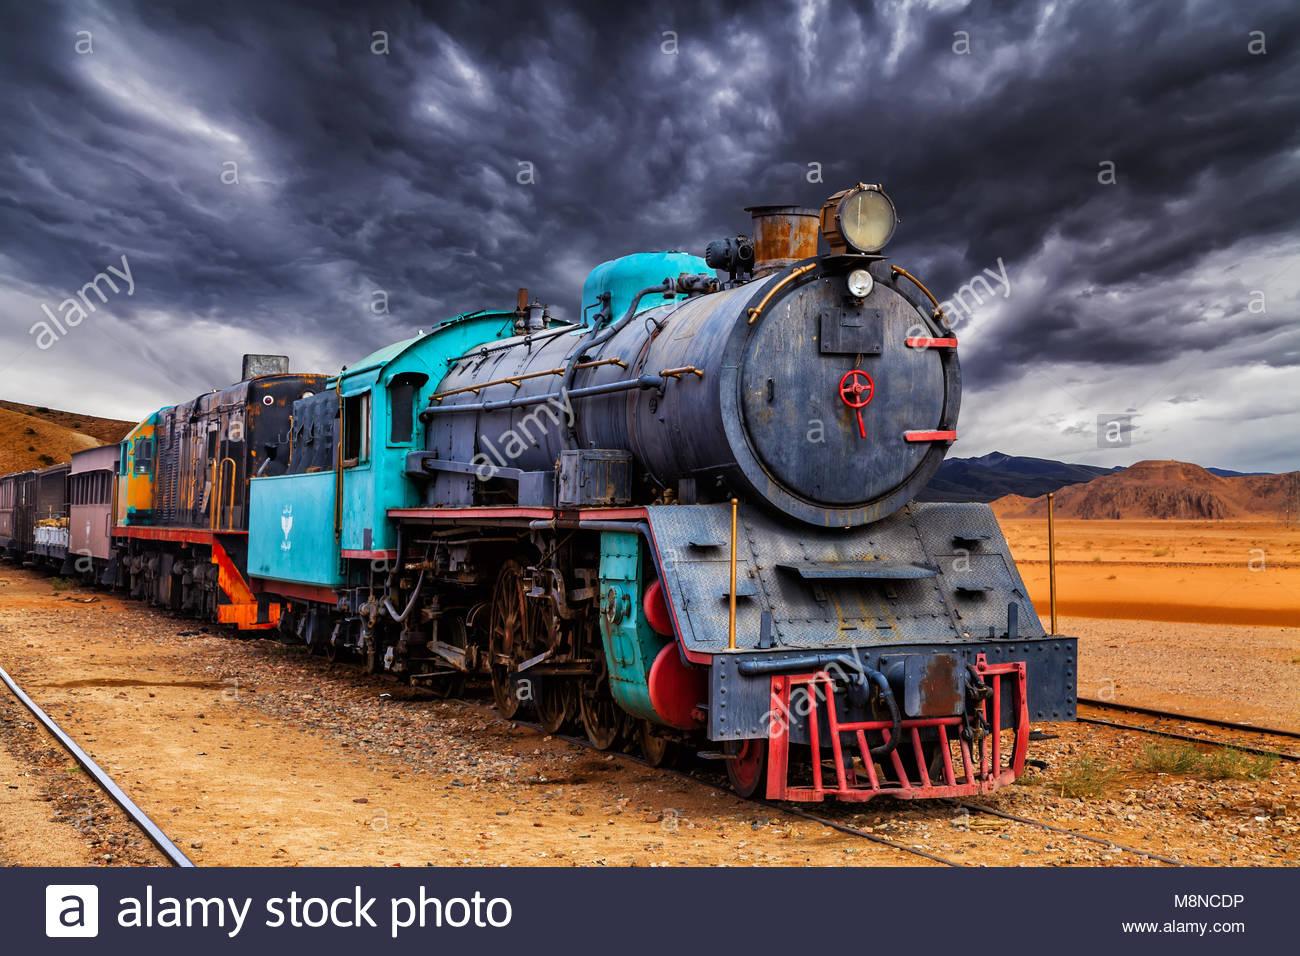 Lok Zug in Wadi Rum Wüste, Jordanien. Stockfoto